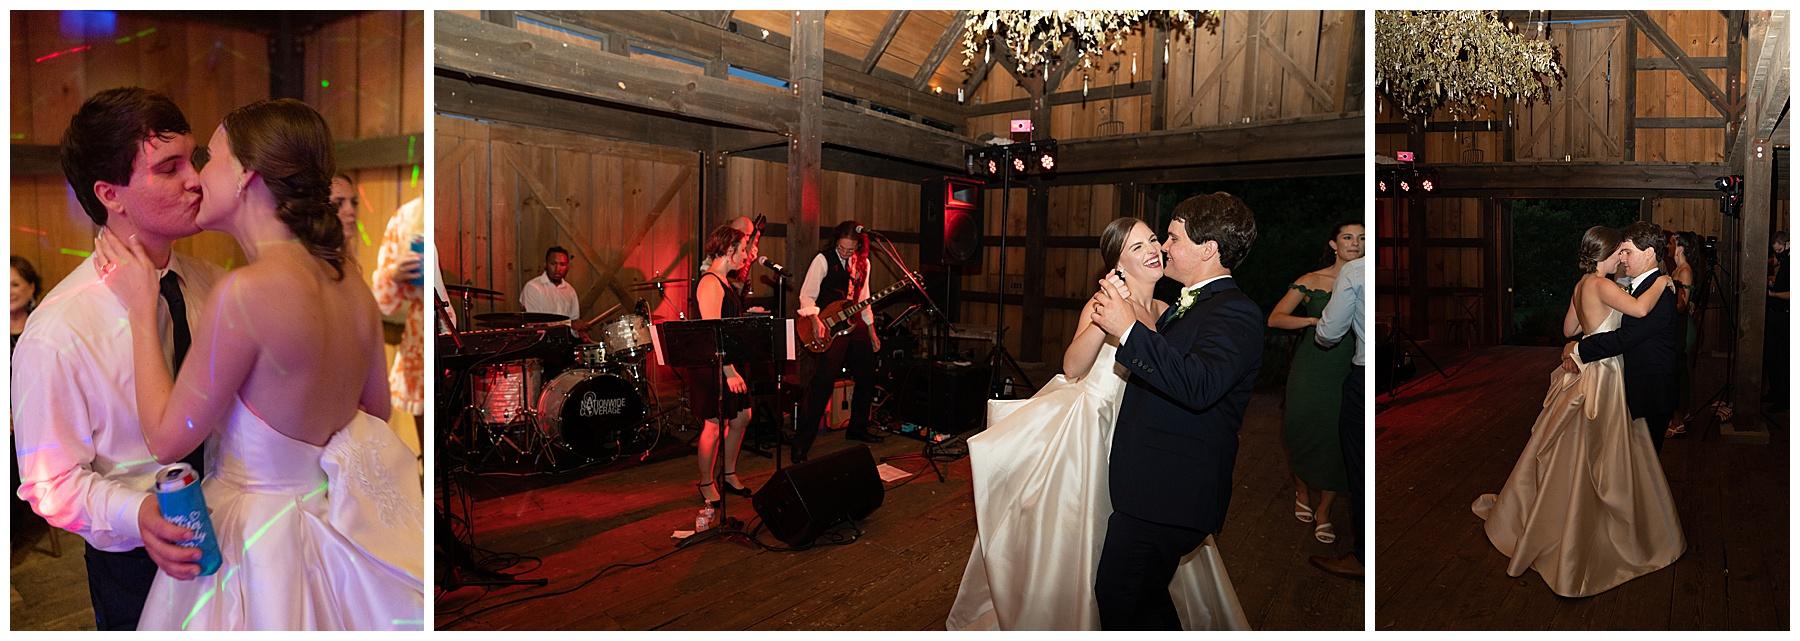 j&d farms wedding dancing